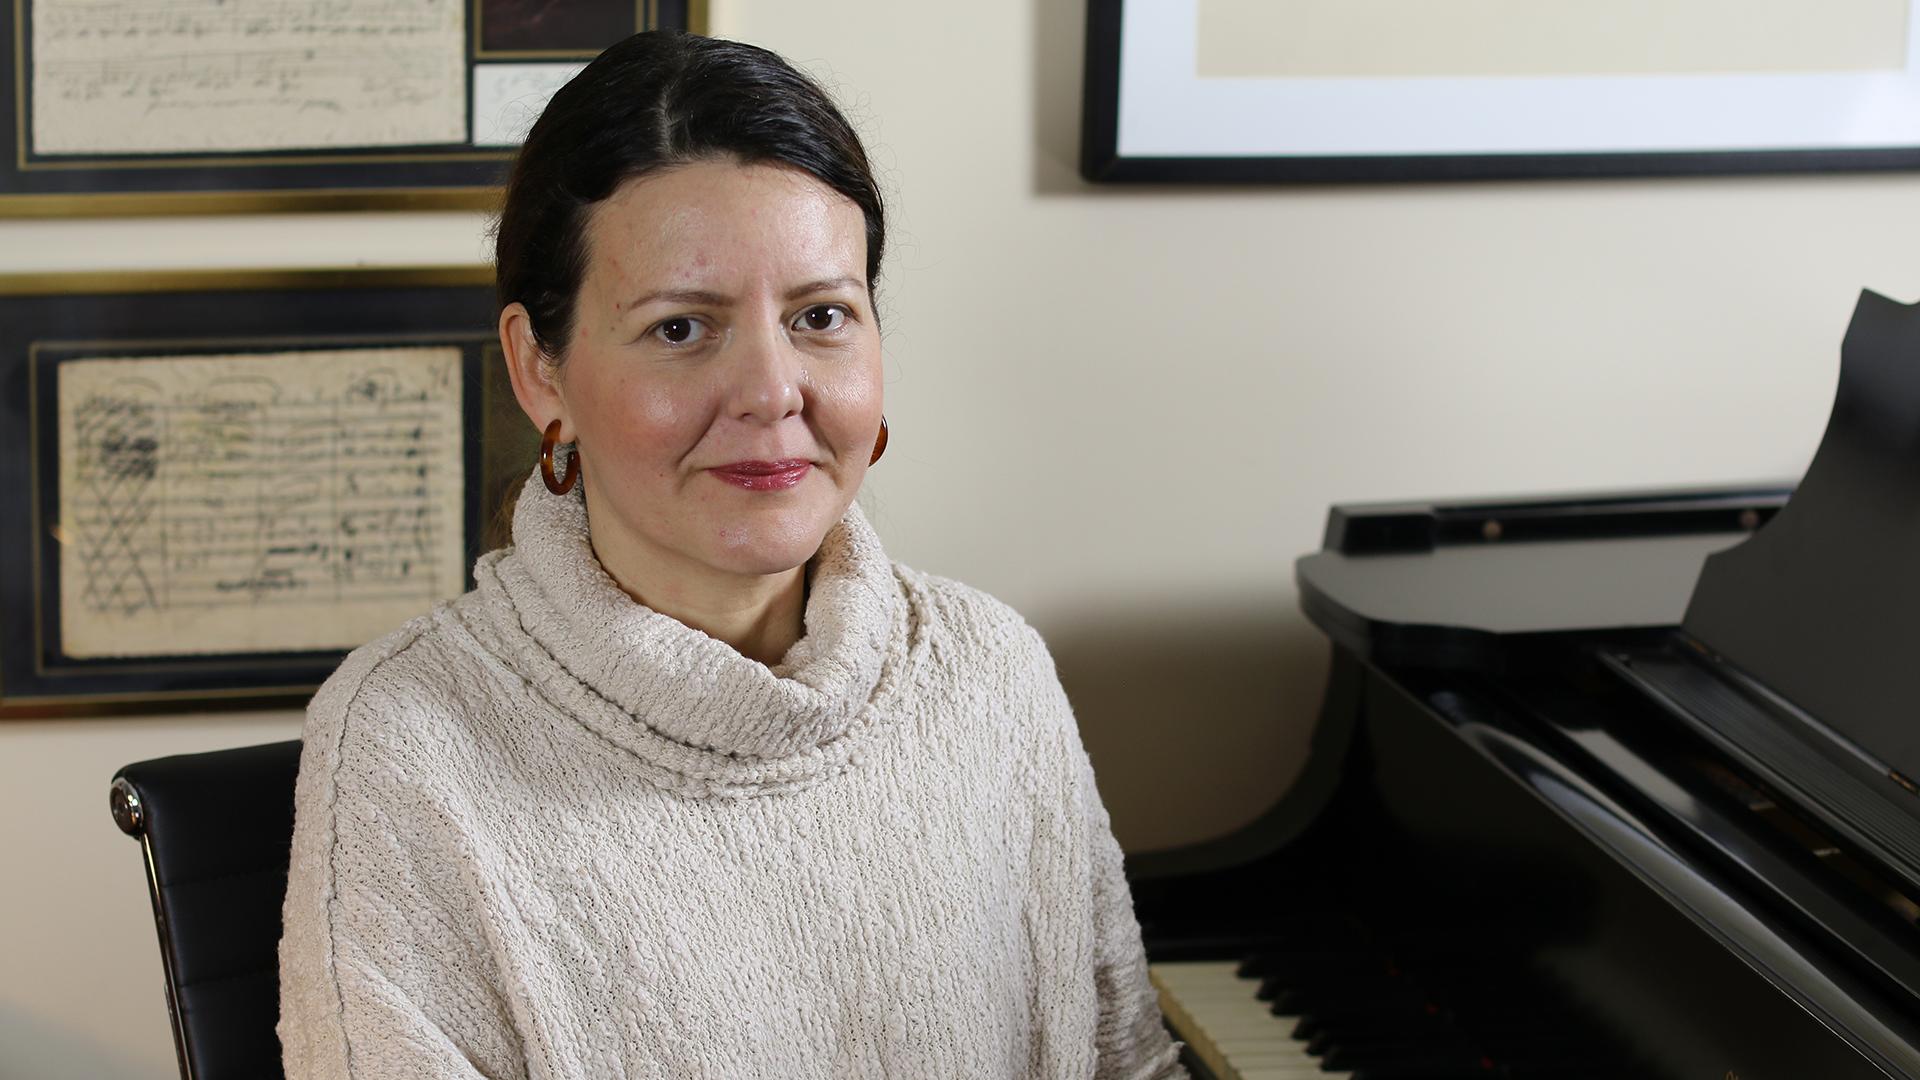 Ana Luisa Johnson — Photo Credit: Shefik